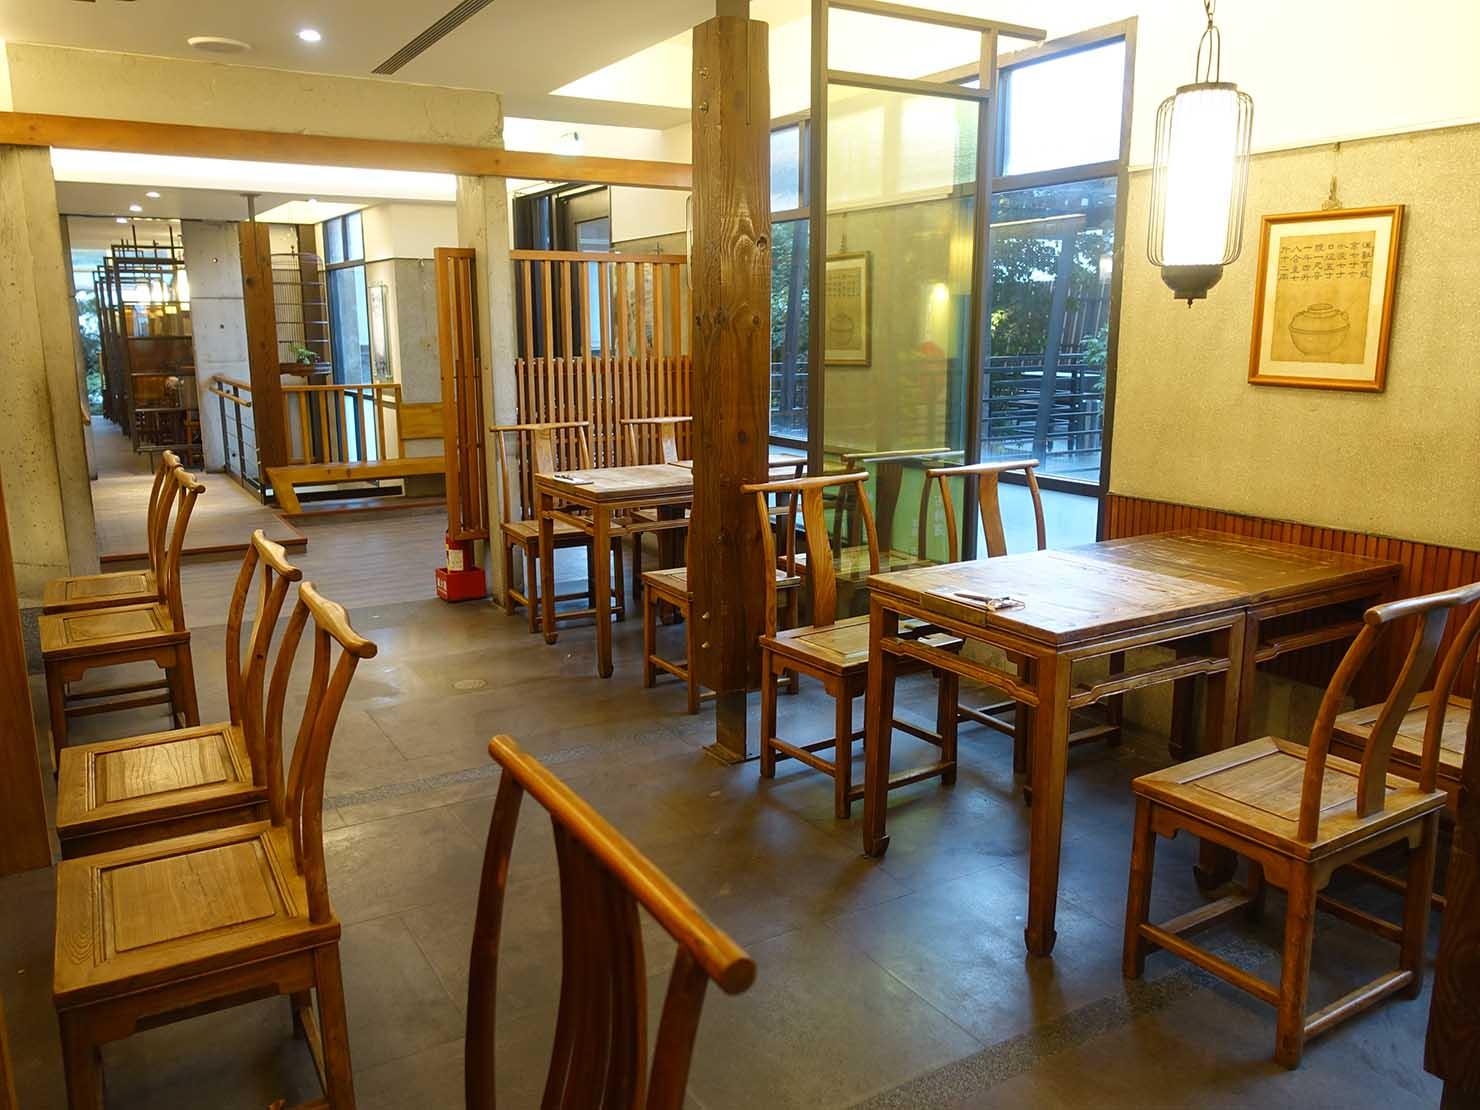 KKday外国人限定「花蓮・太魯閣(タロコ)日帰りツアー」夕食で立ち寄った王記茶舖のテーブル席